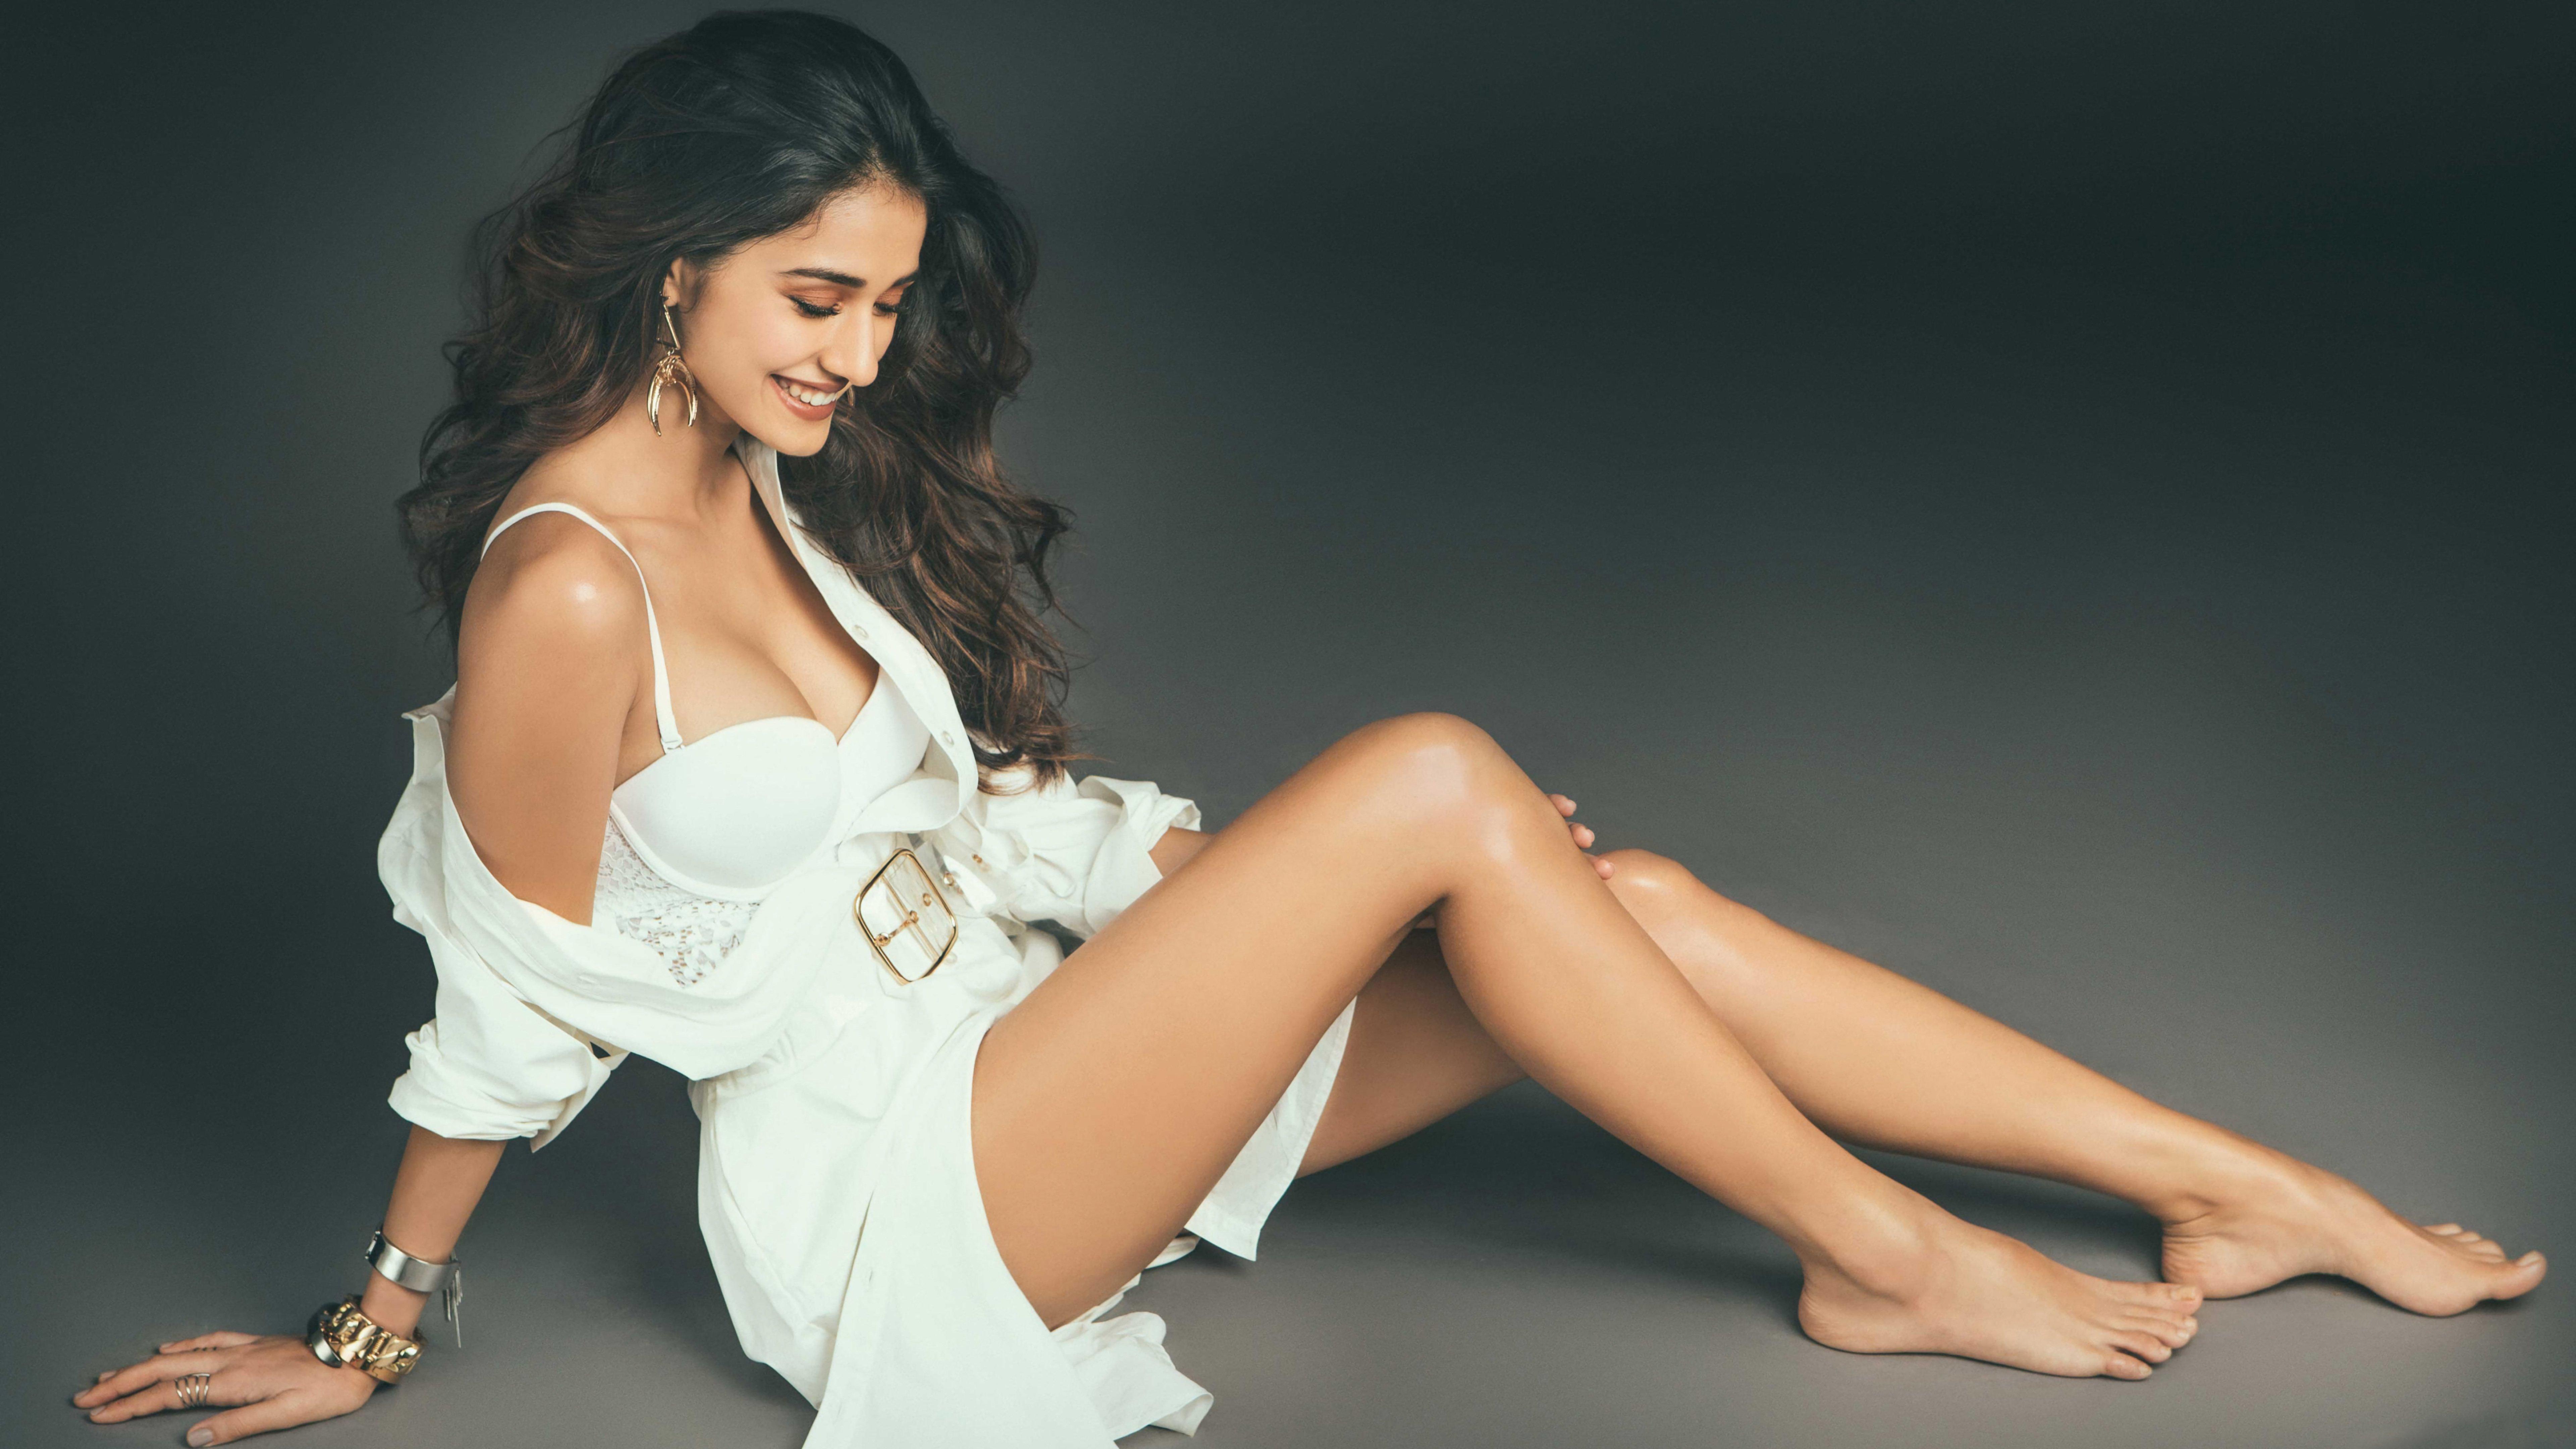 Fondos de pantalla Disha Patani con vestido blanco